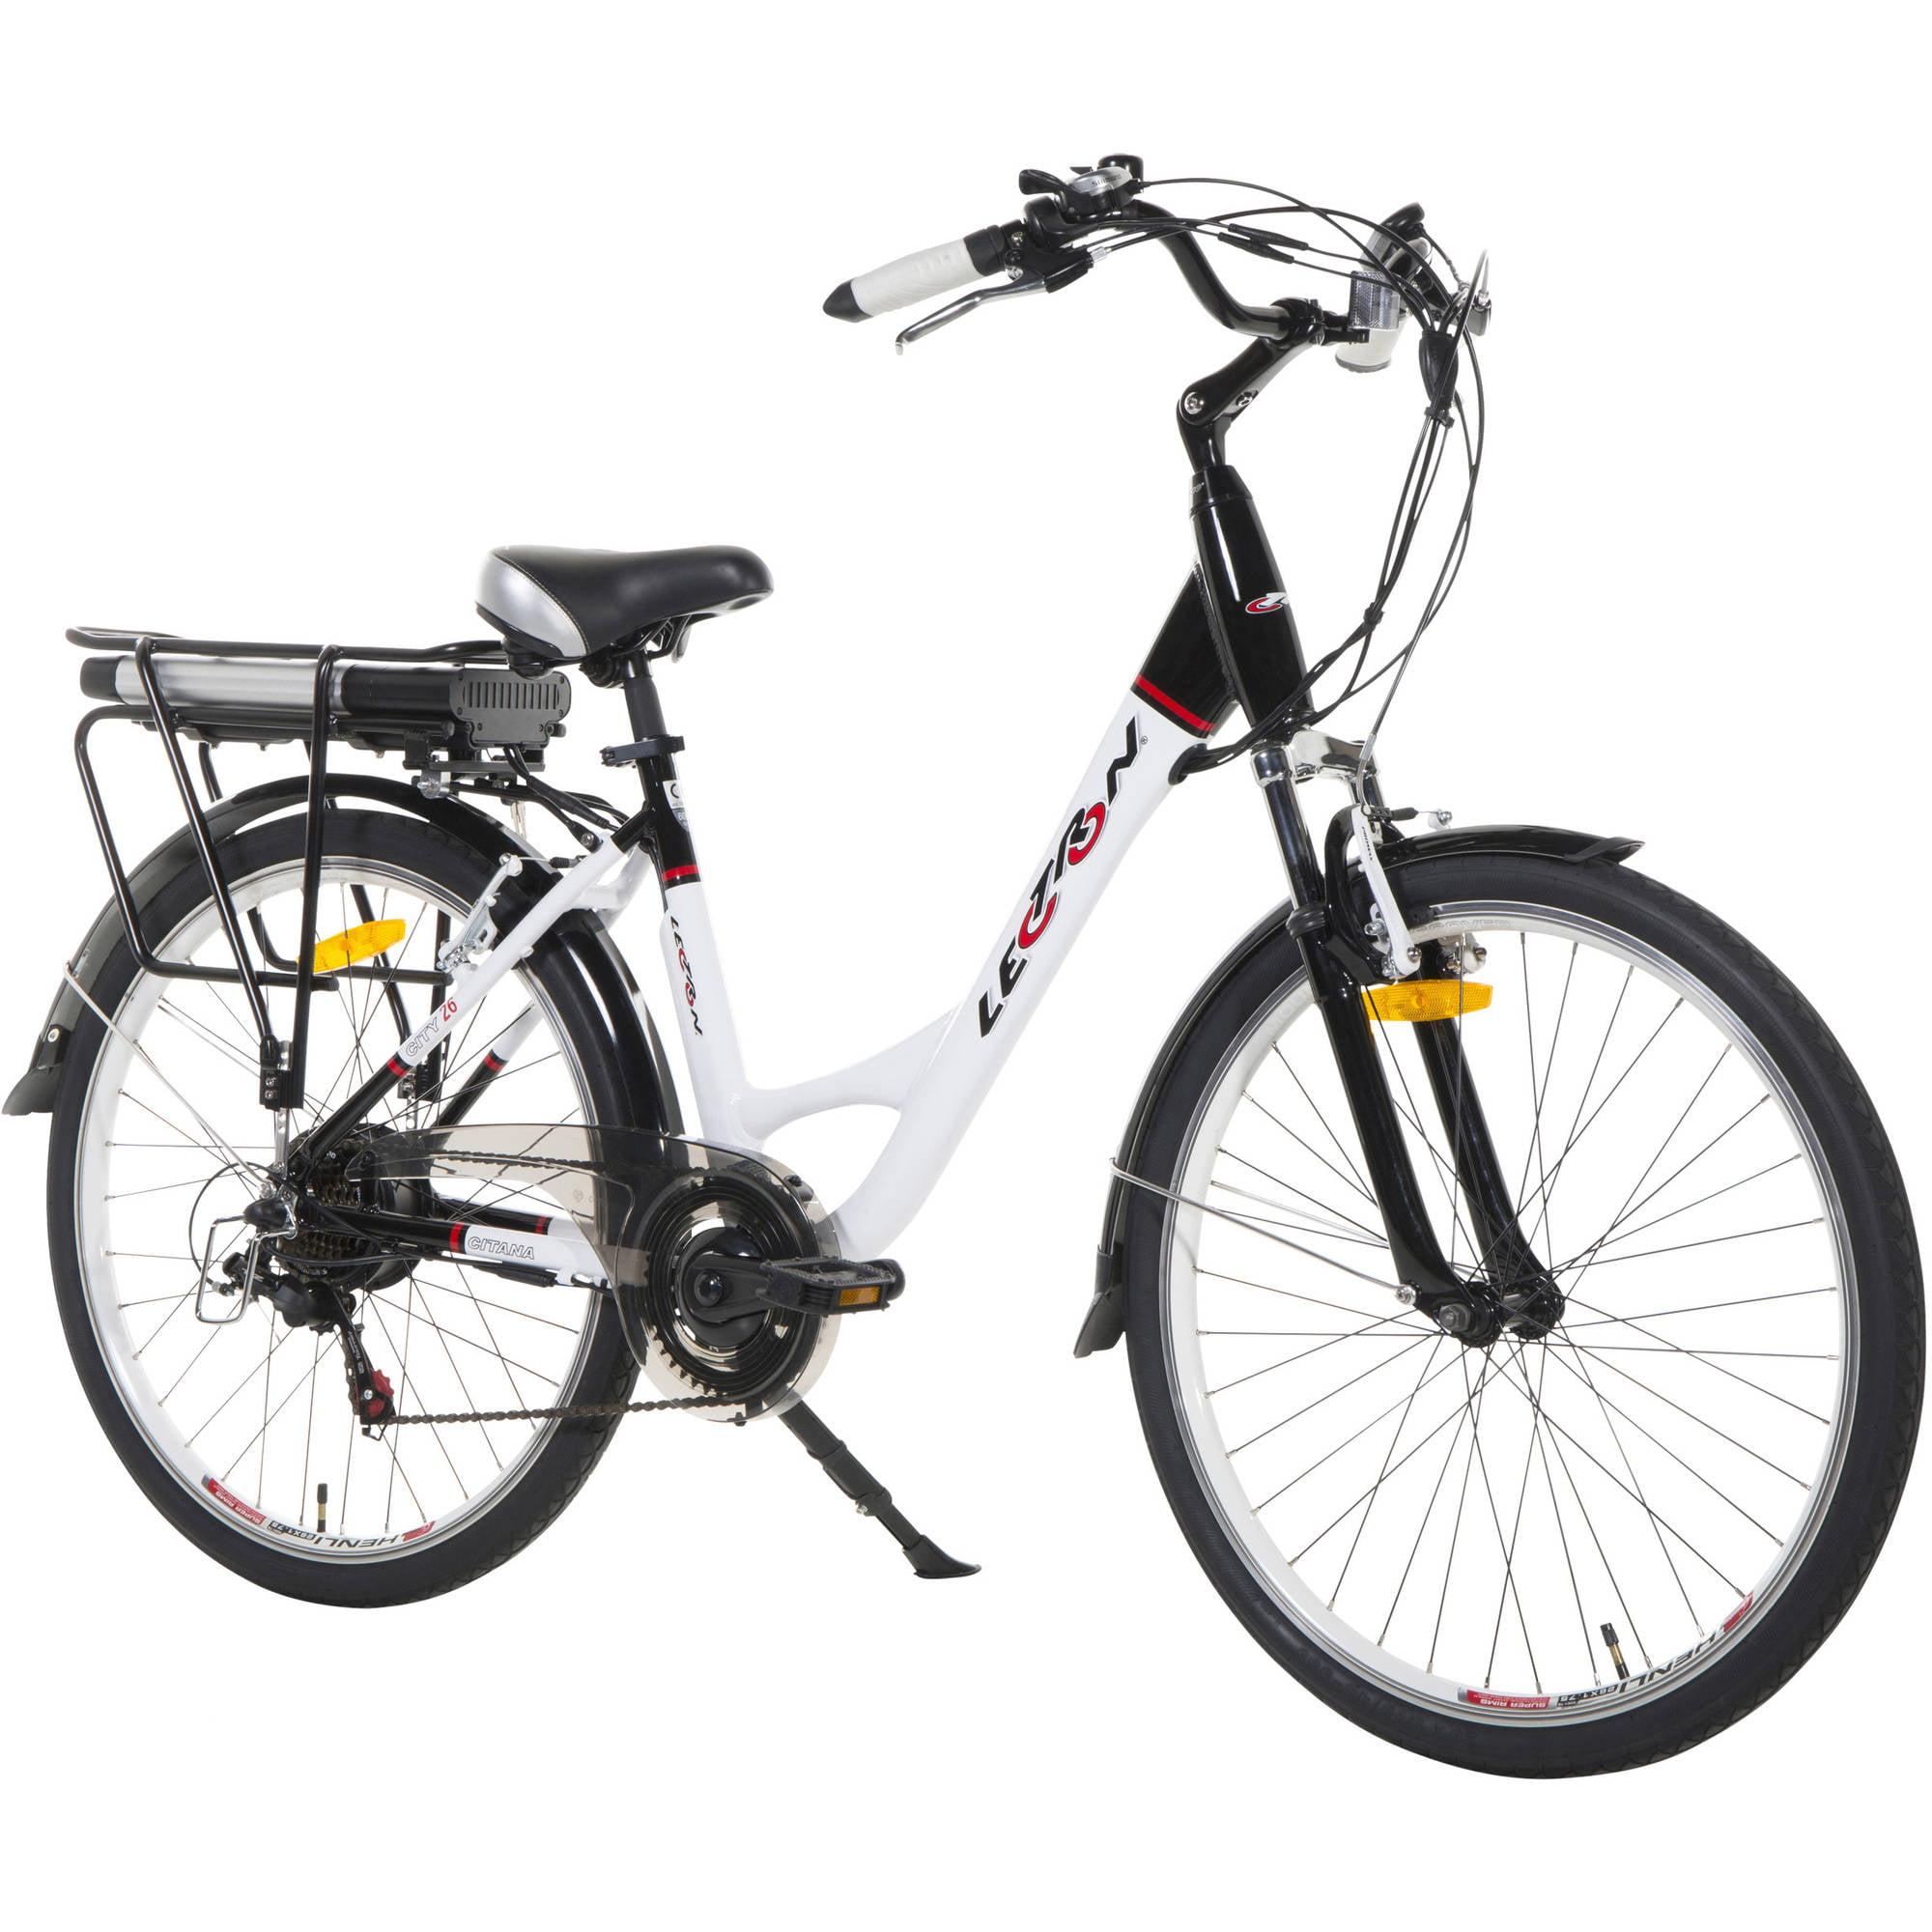 "26"" Dynacraft 700C City Scape Pedal Assist Bike"